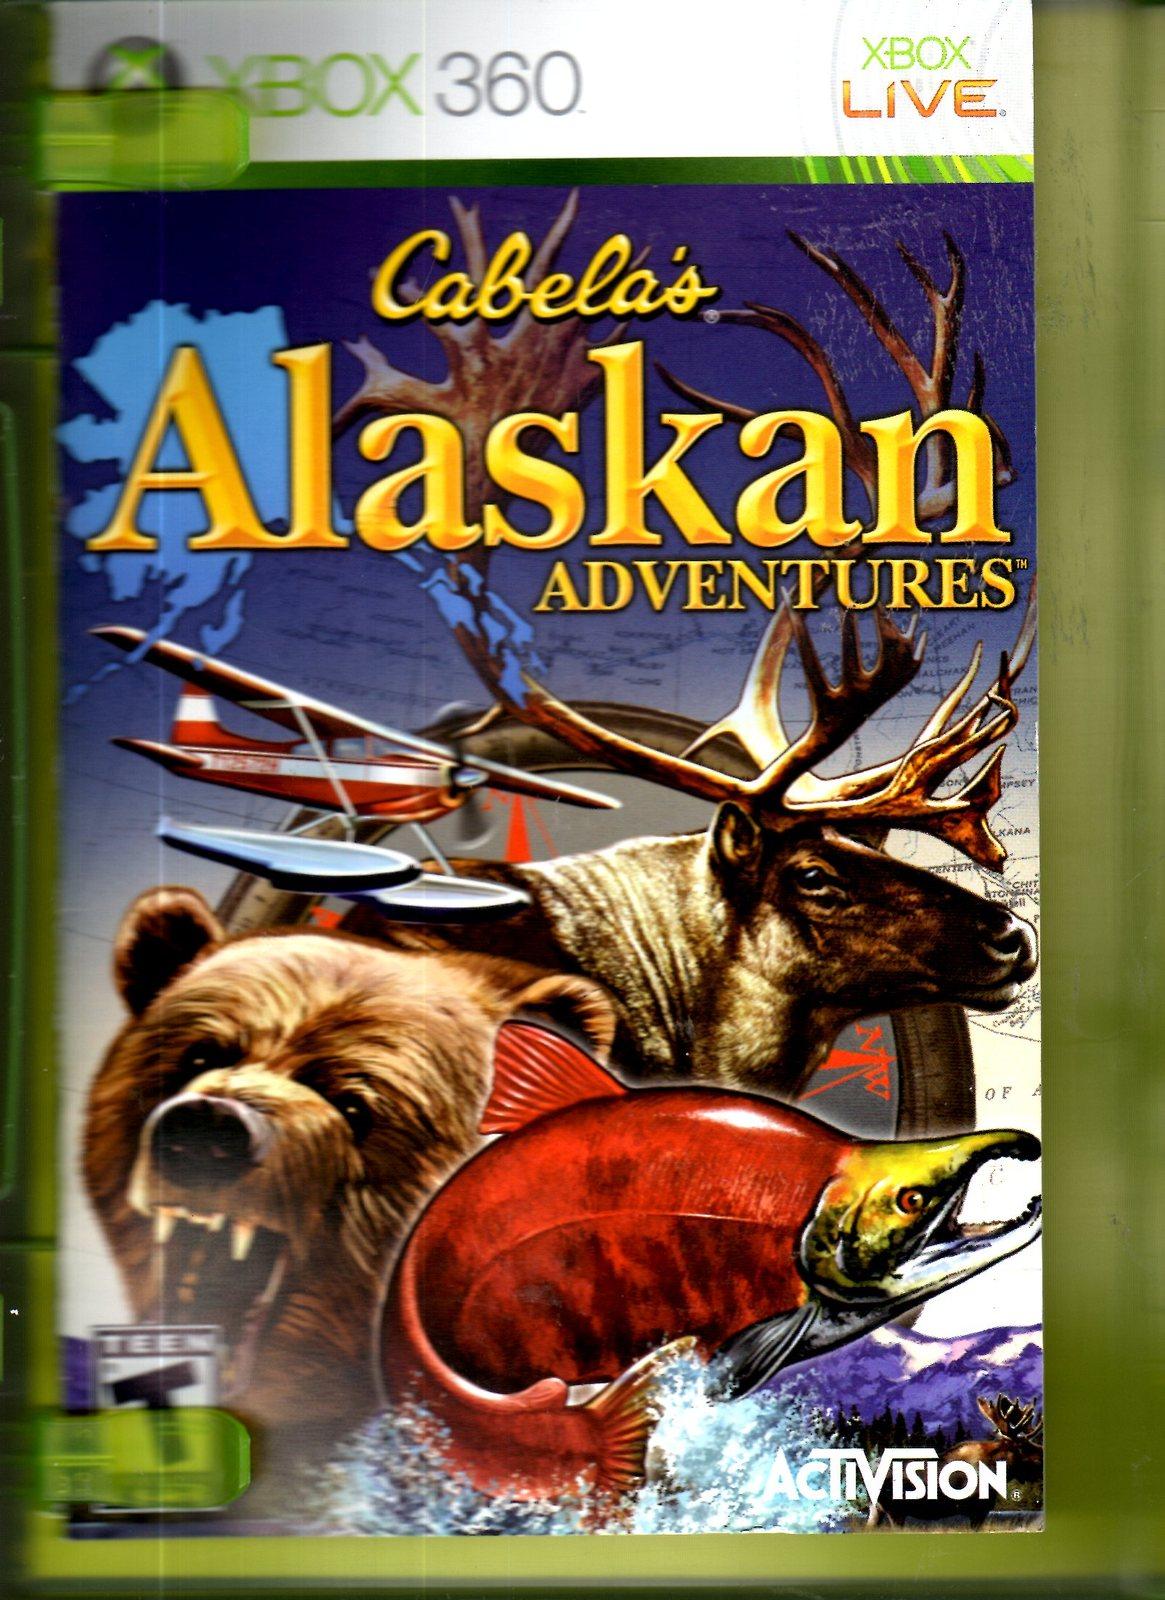 XBOX 360 - Cabela's Alaskan Adventures